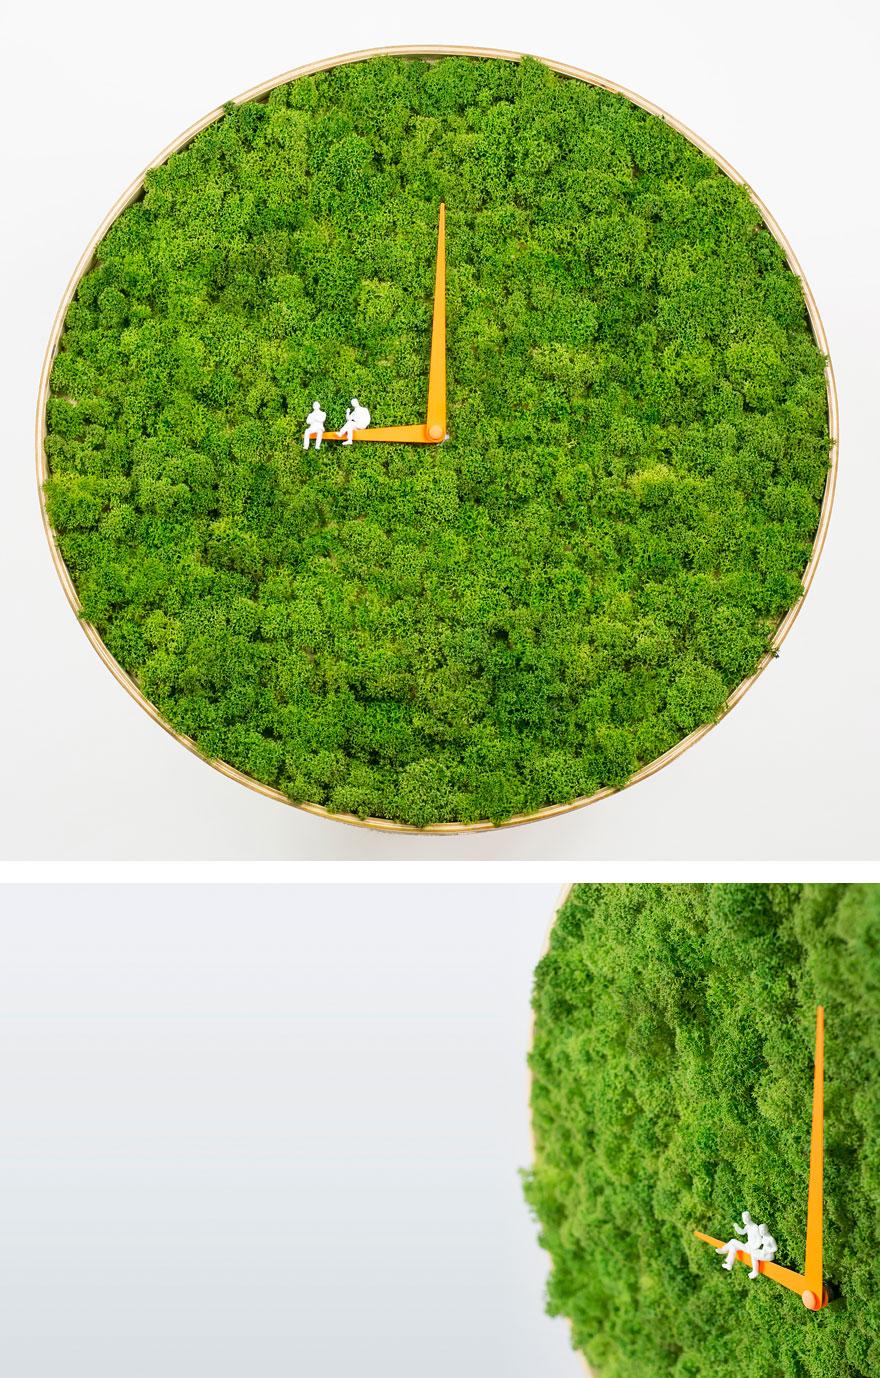 creative-flower-planters-252__880 (1)